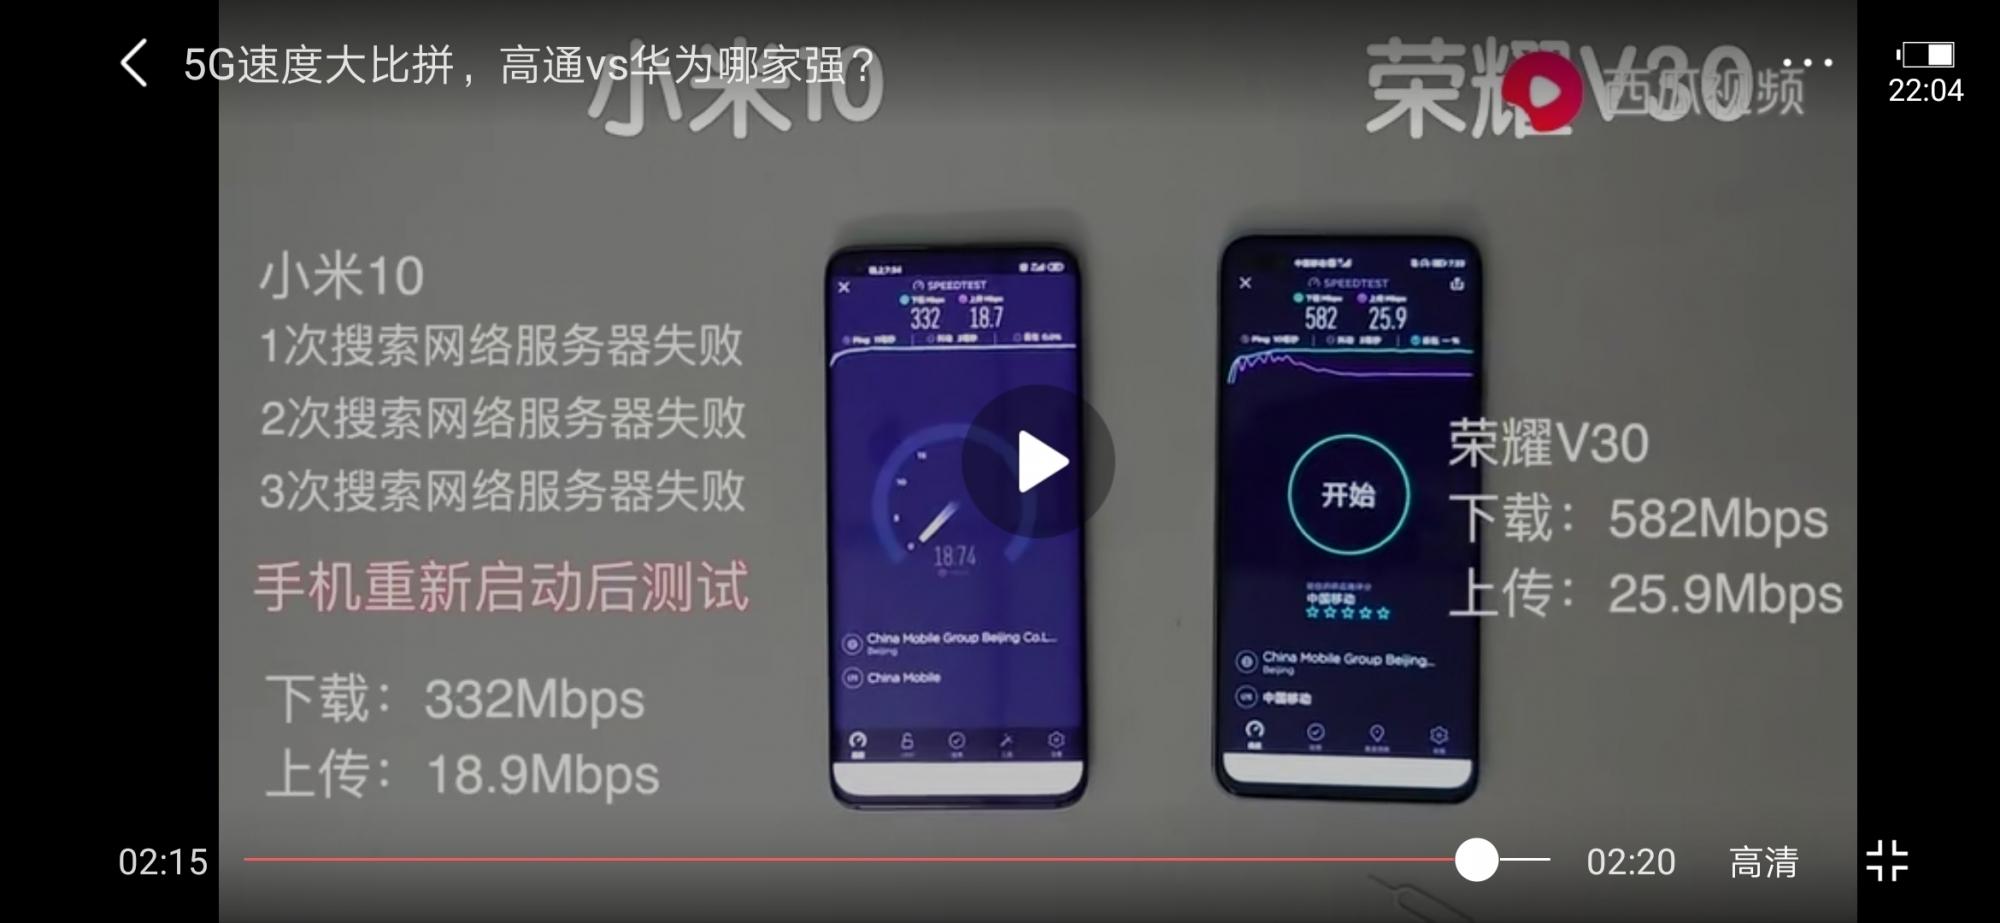 Screenshot_20200218_220450_com.ss.android.article.news.jpg